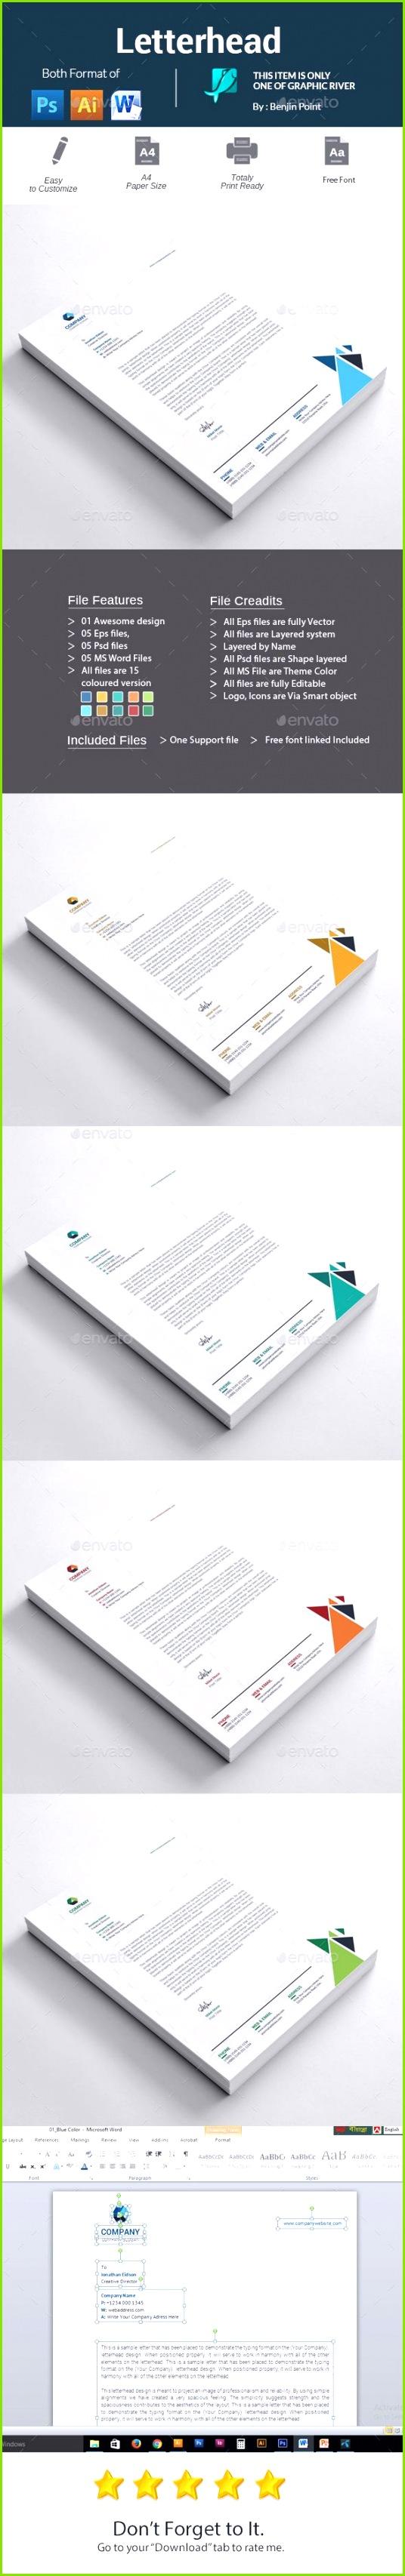 Letterhead Template PSD Vector EPS AI Illustrator MS Word